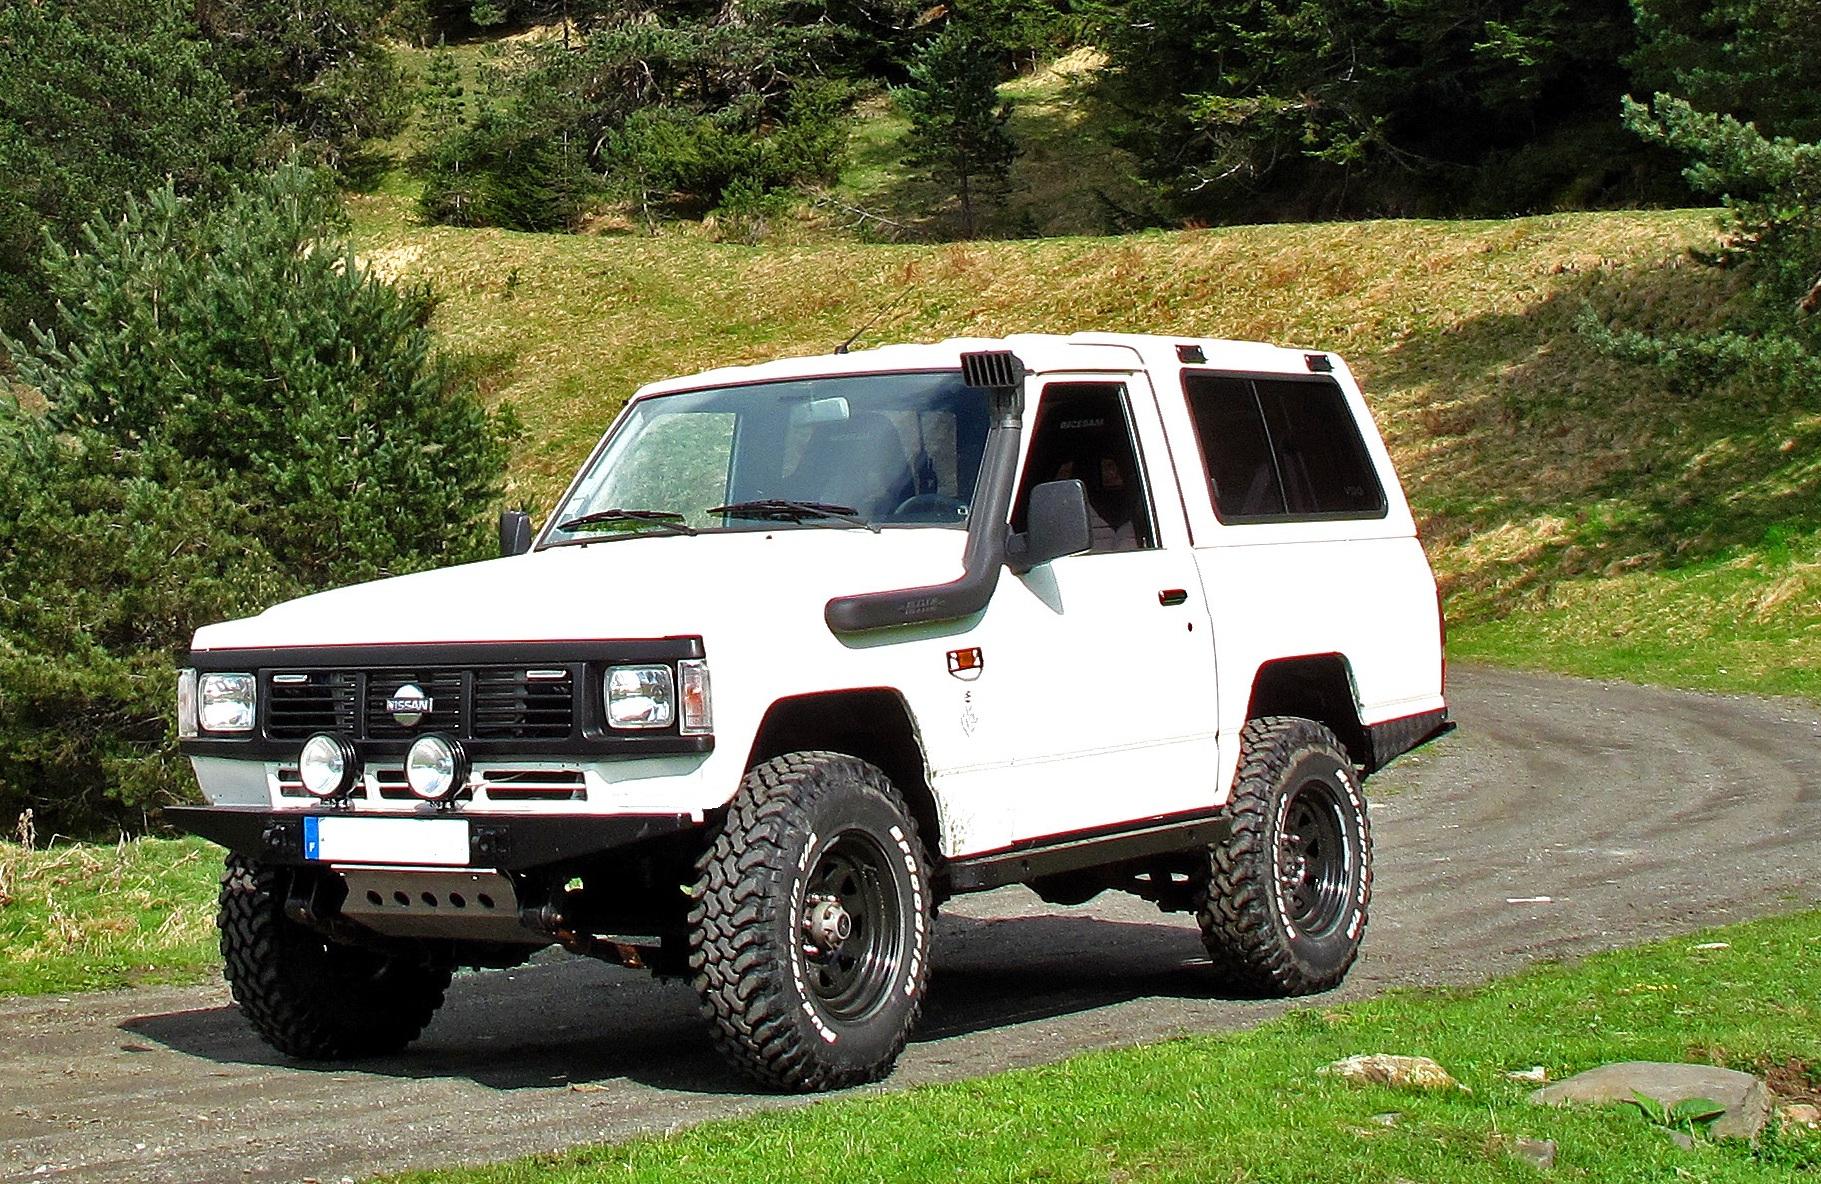 File:Nissan Patrol Baroud.jpg - Wikimedia Commons